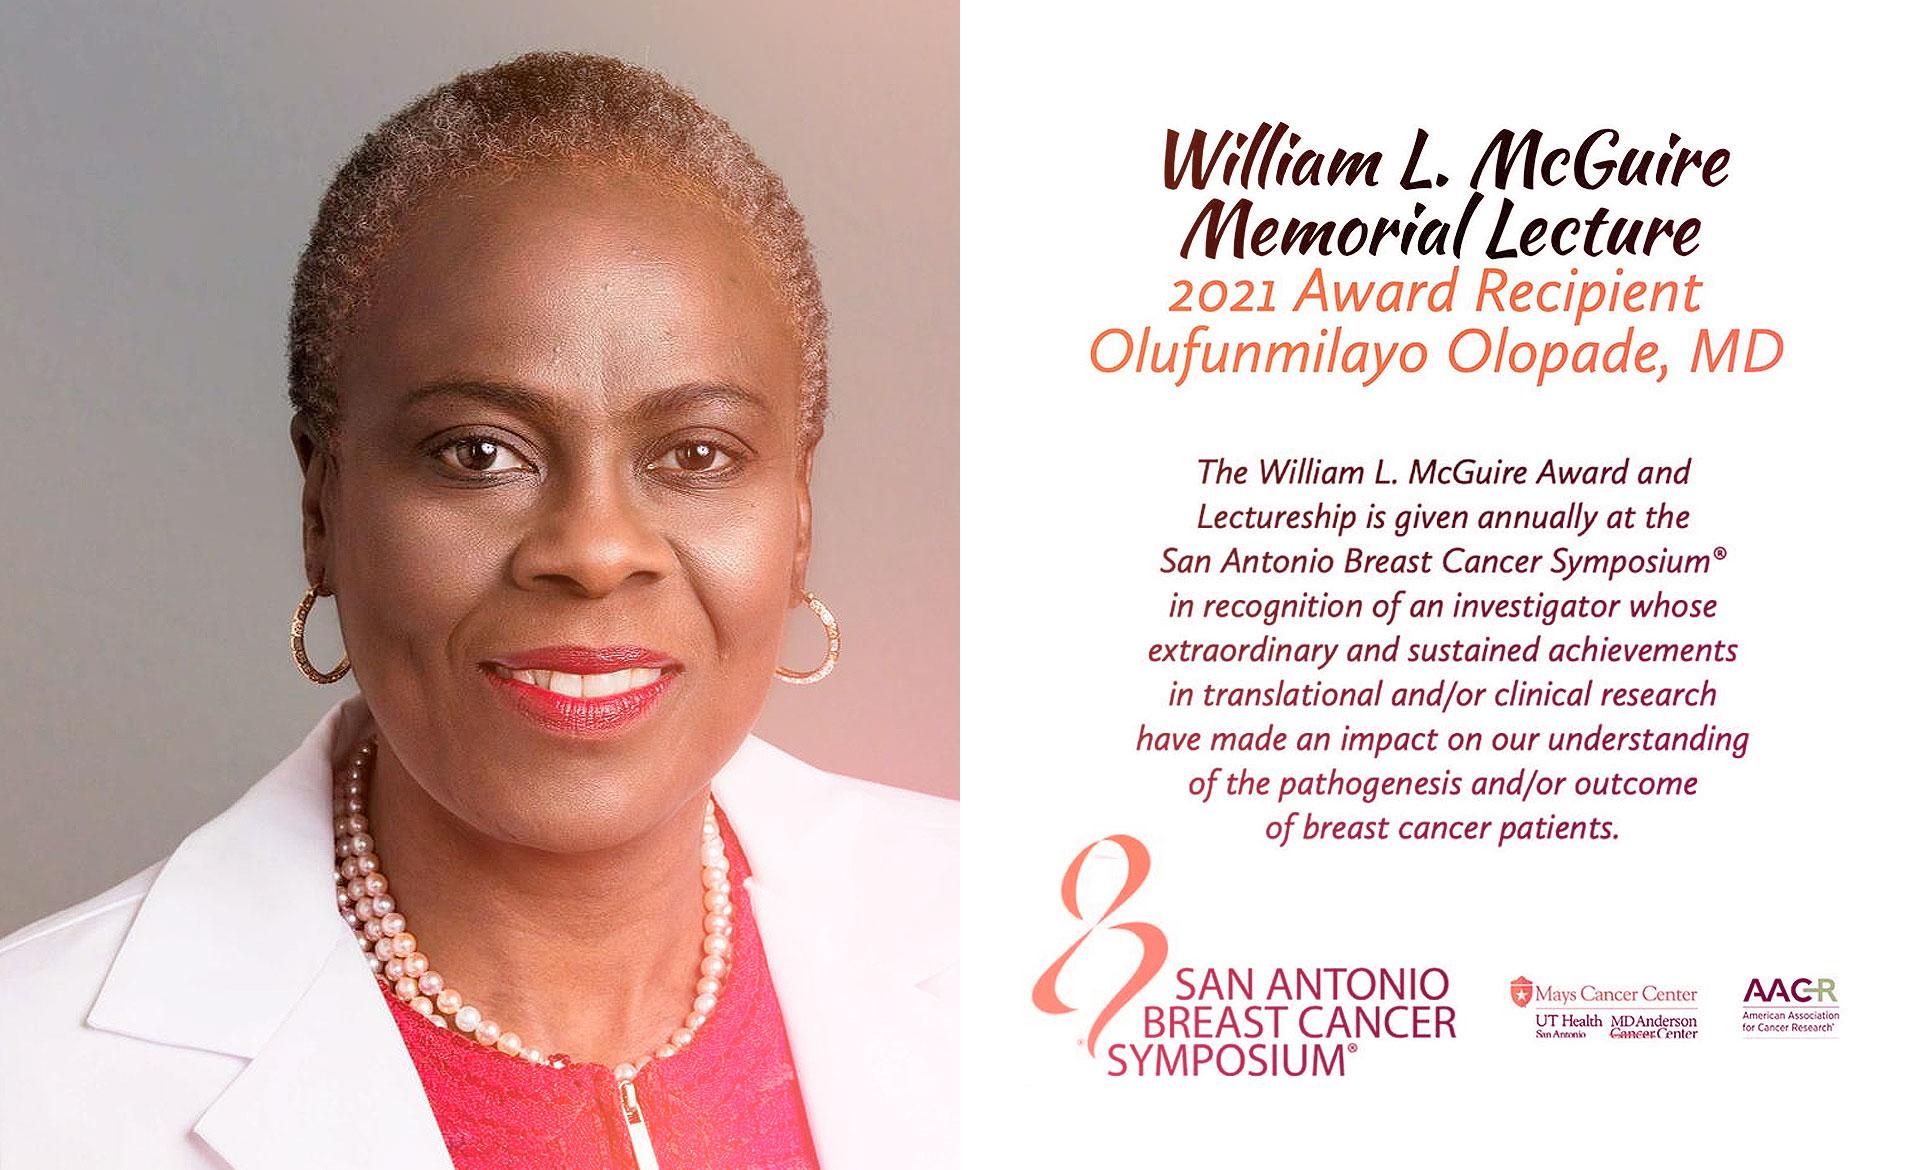 Dra. Olufunmilayo Olopade receberá prêmio este ano no próximo San Antonio Breast Cancer Symposium